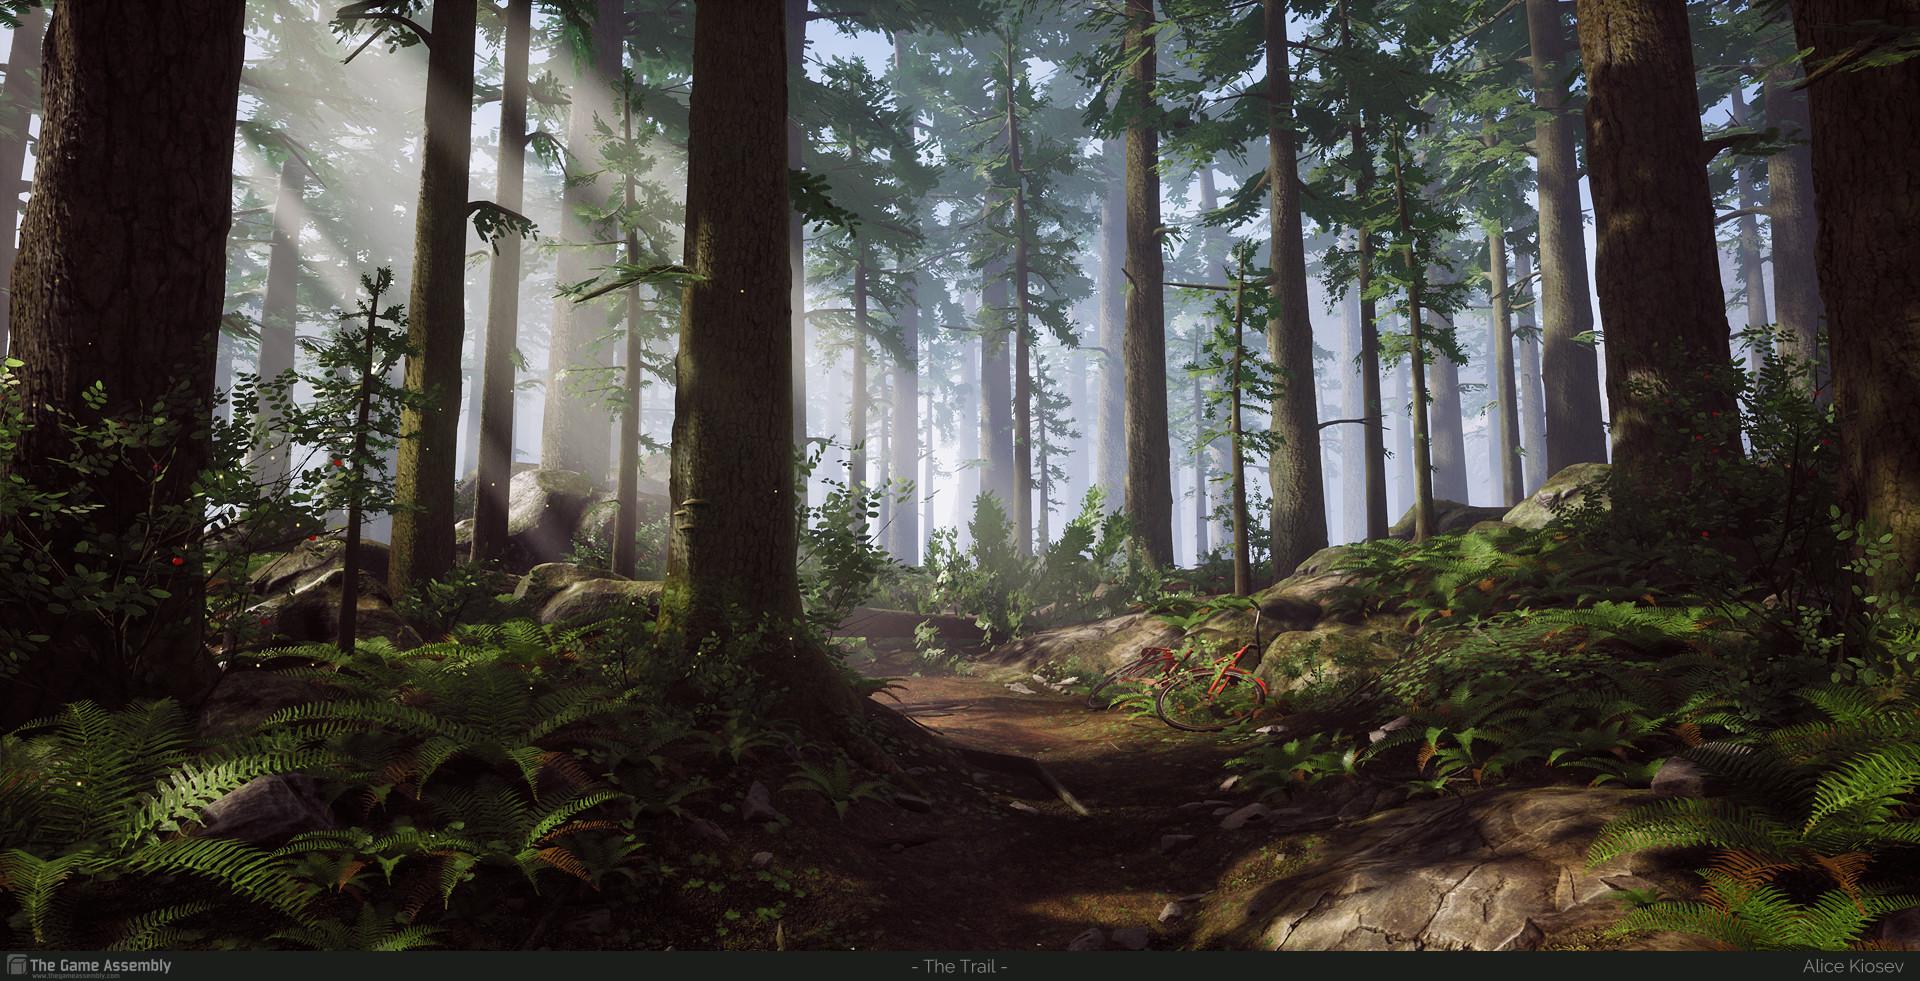 Alice kiosev alicekiosevpineforest01